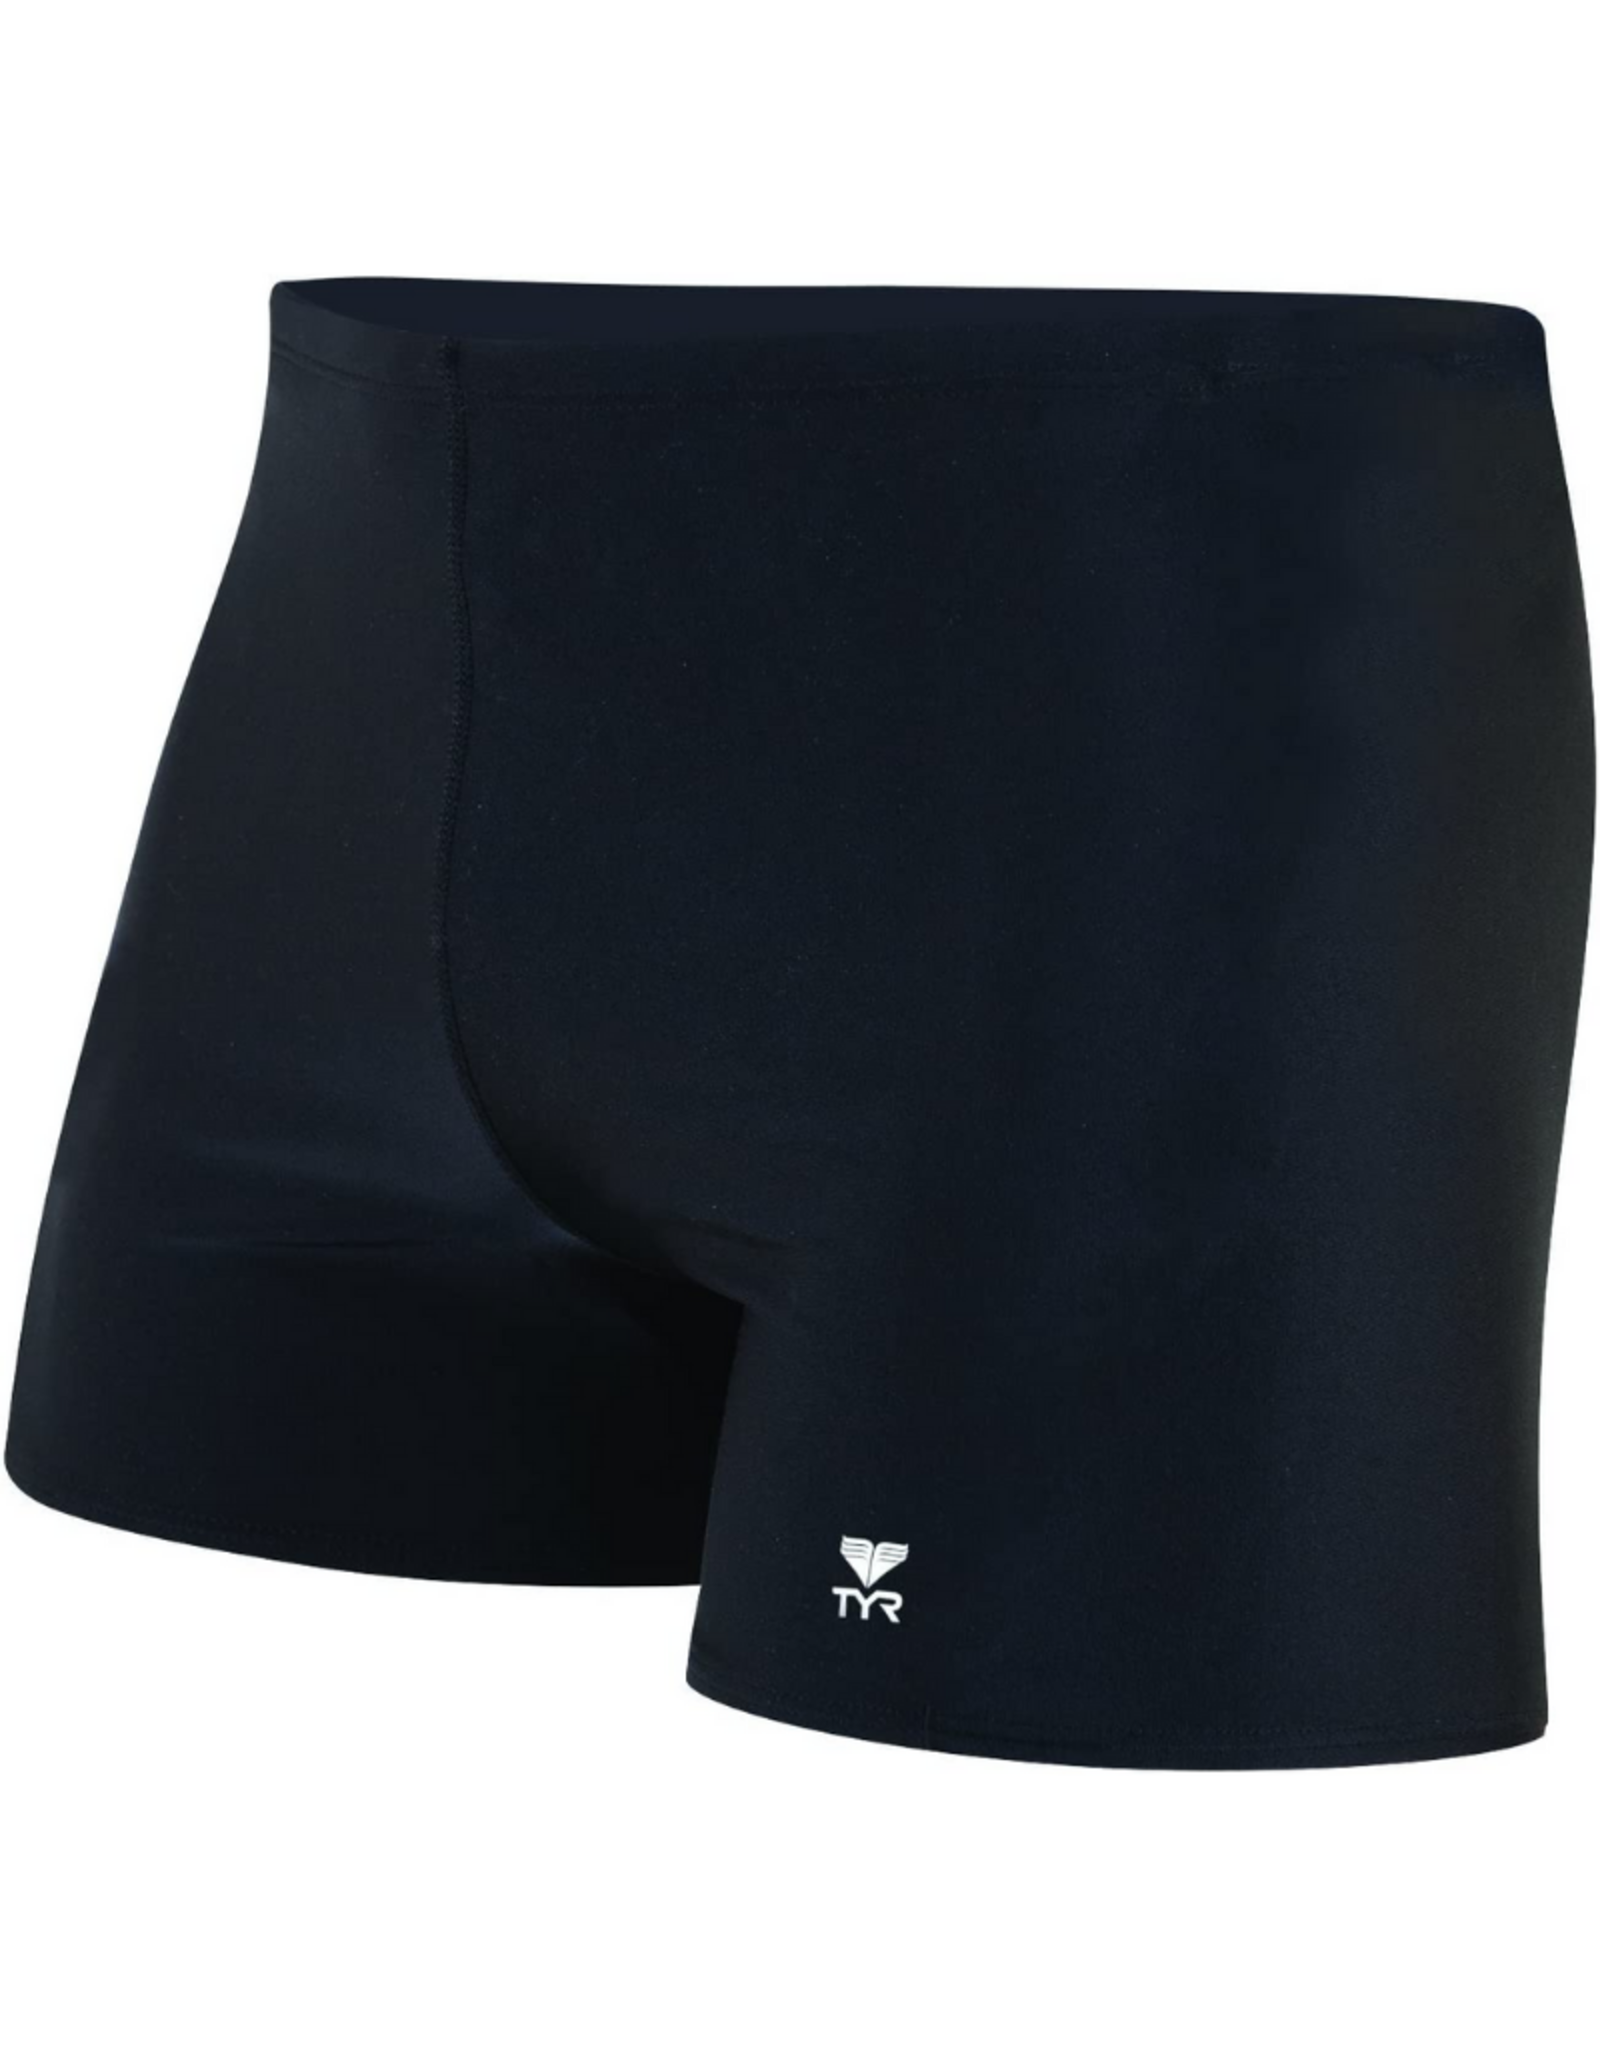 TYR Mens Square Leg Swimwear Black